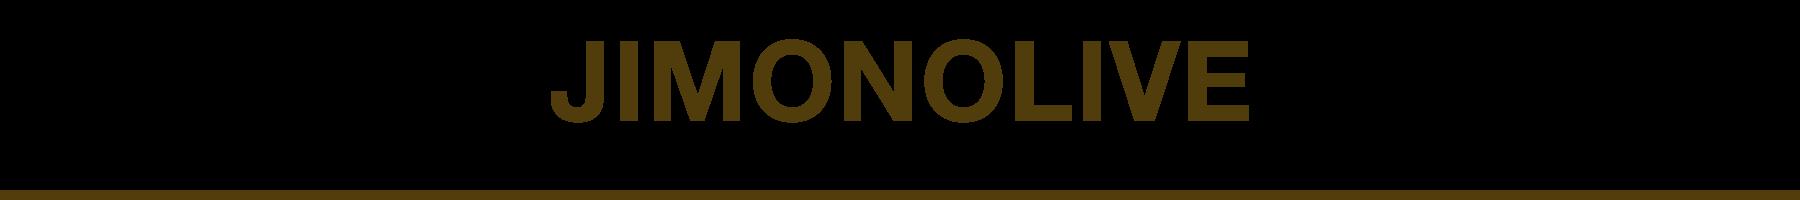 jimonolive_logo_indivipage